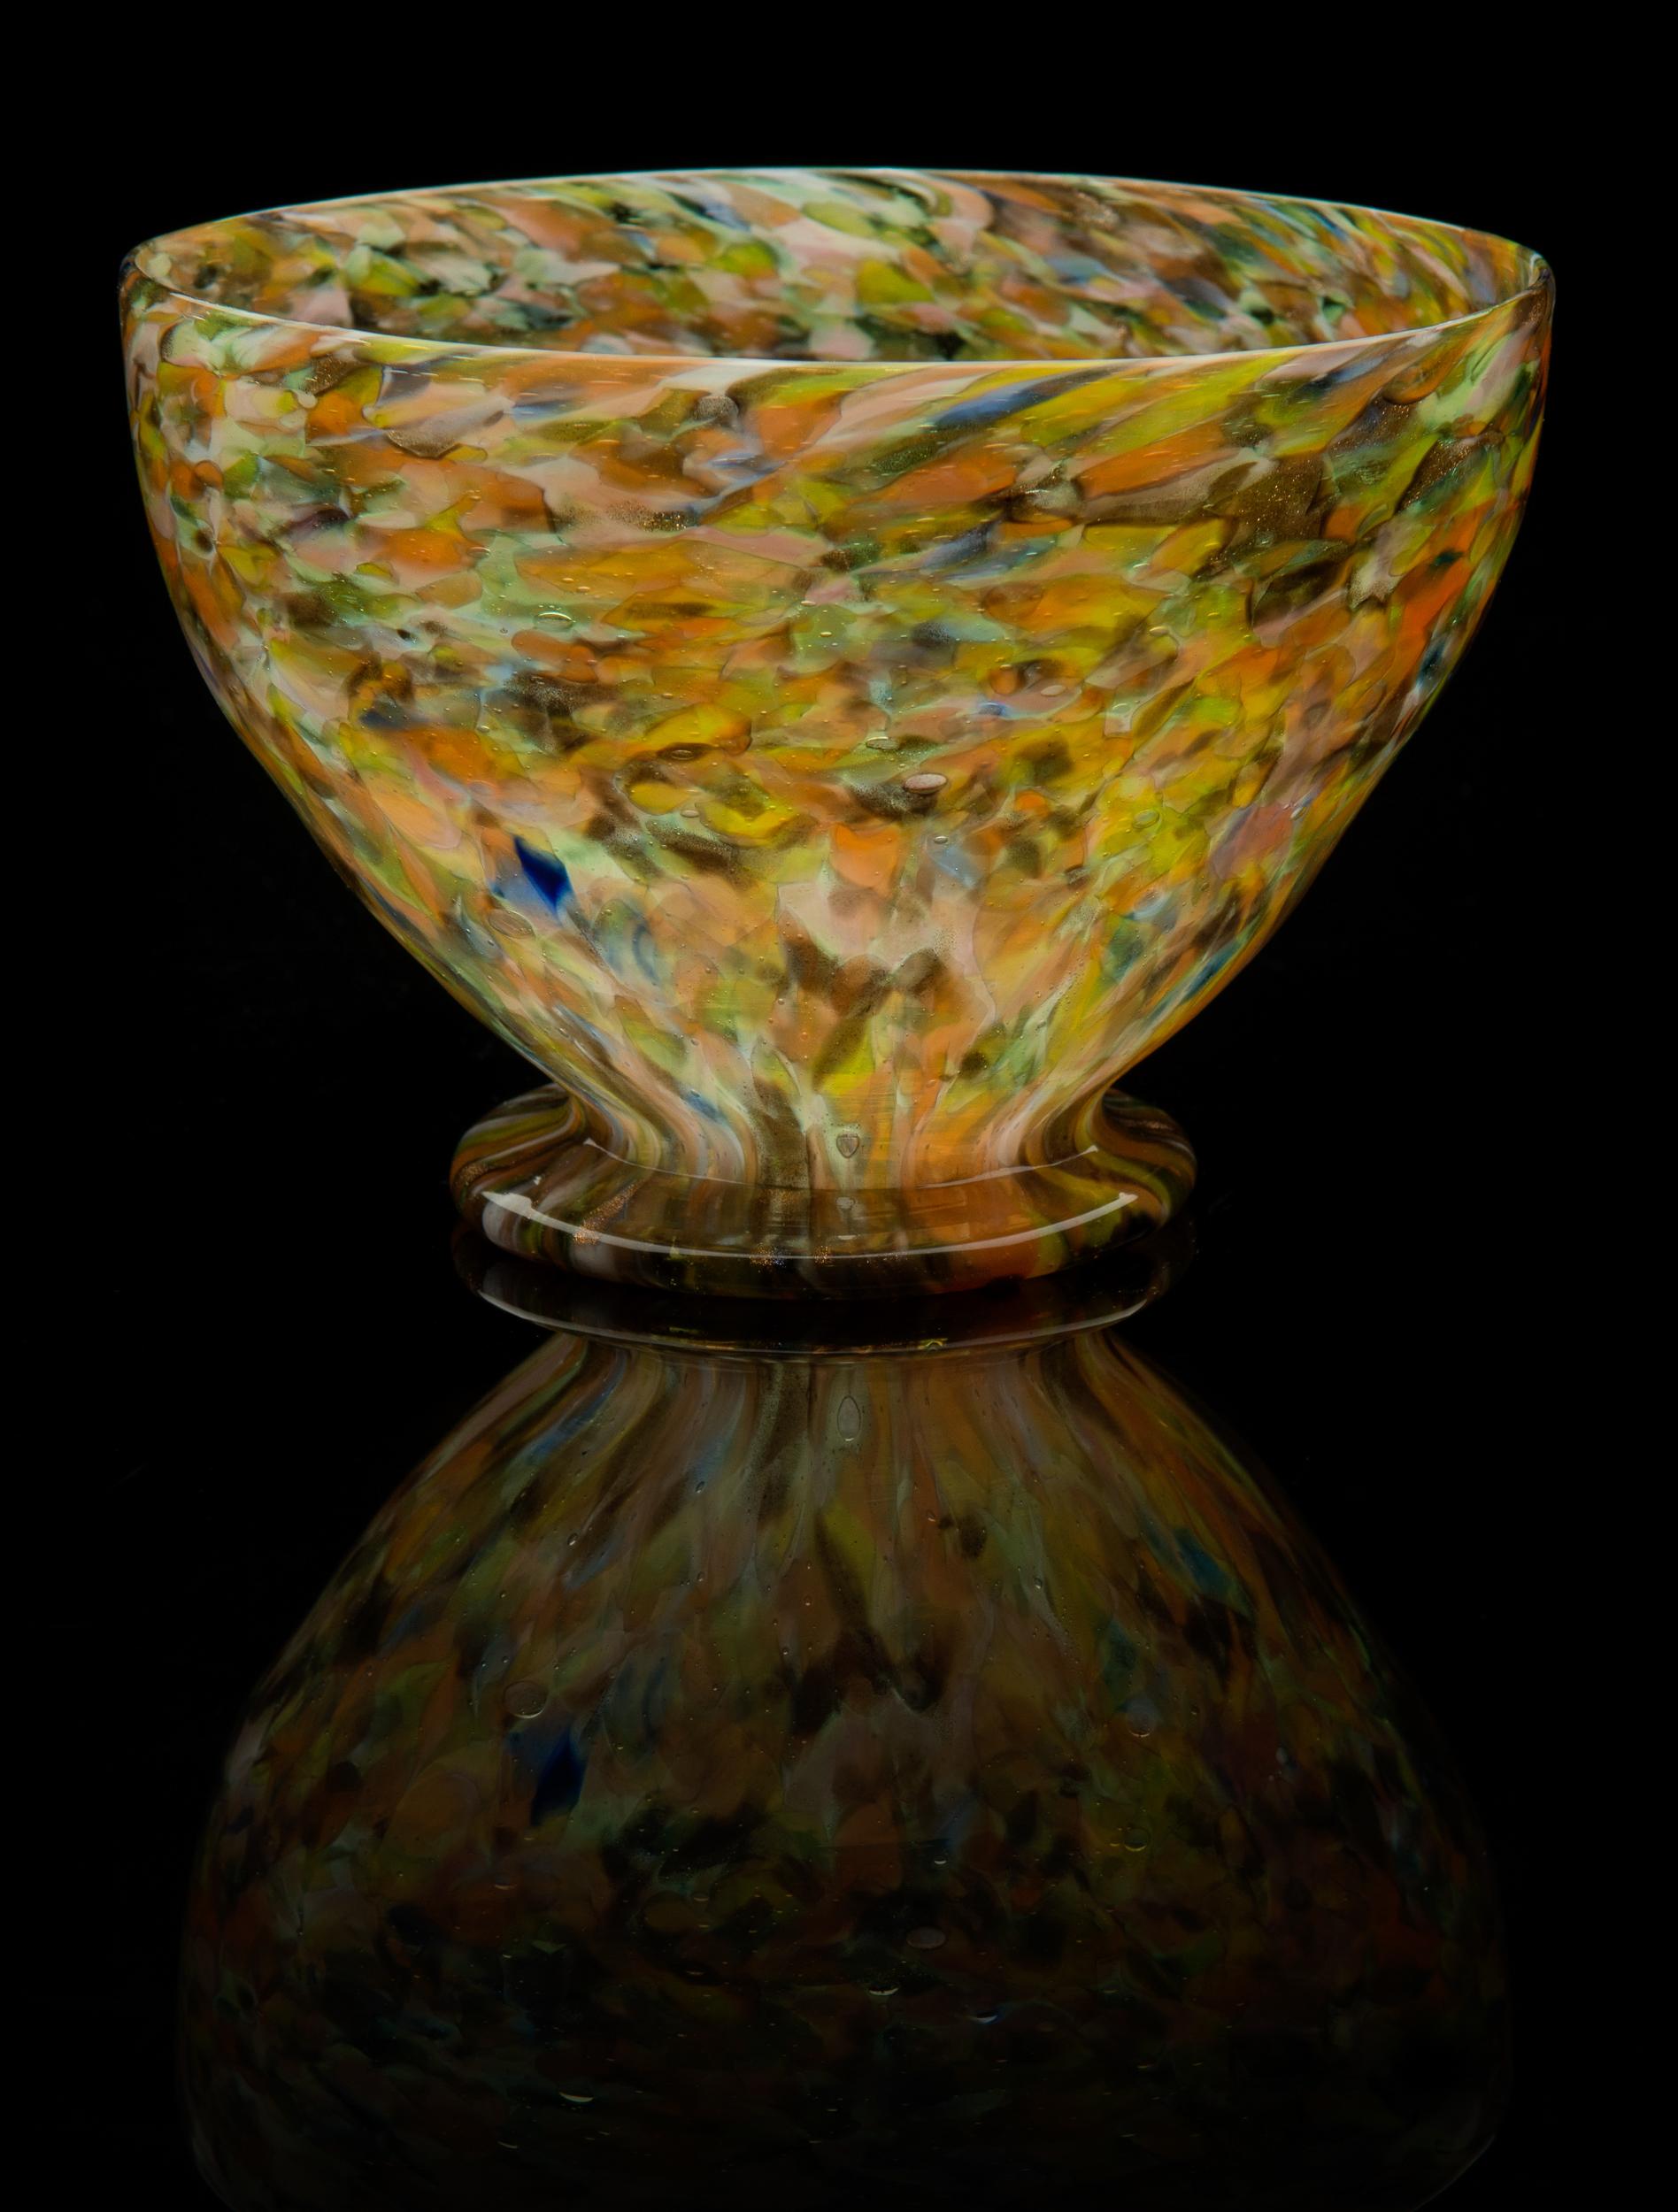 Pietro Bigaglia, Screziato Bowl (1860, glass, 3 5/8 x 5 5/16 x 5 5/16 inches), VV.553